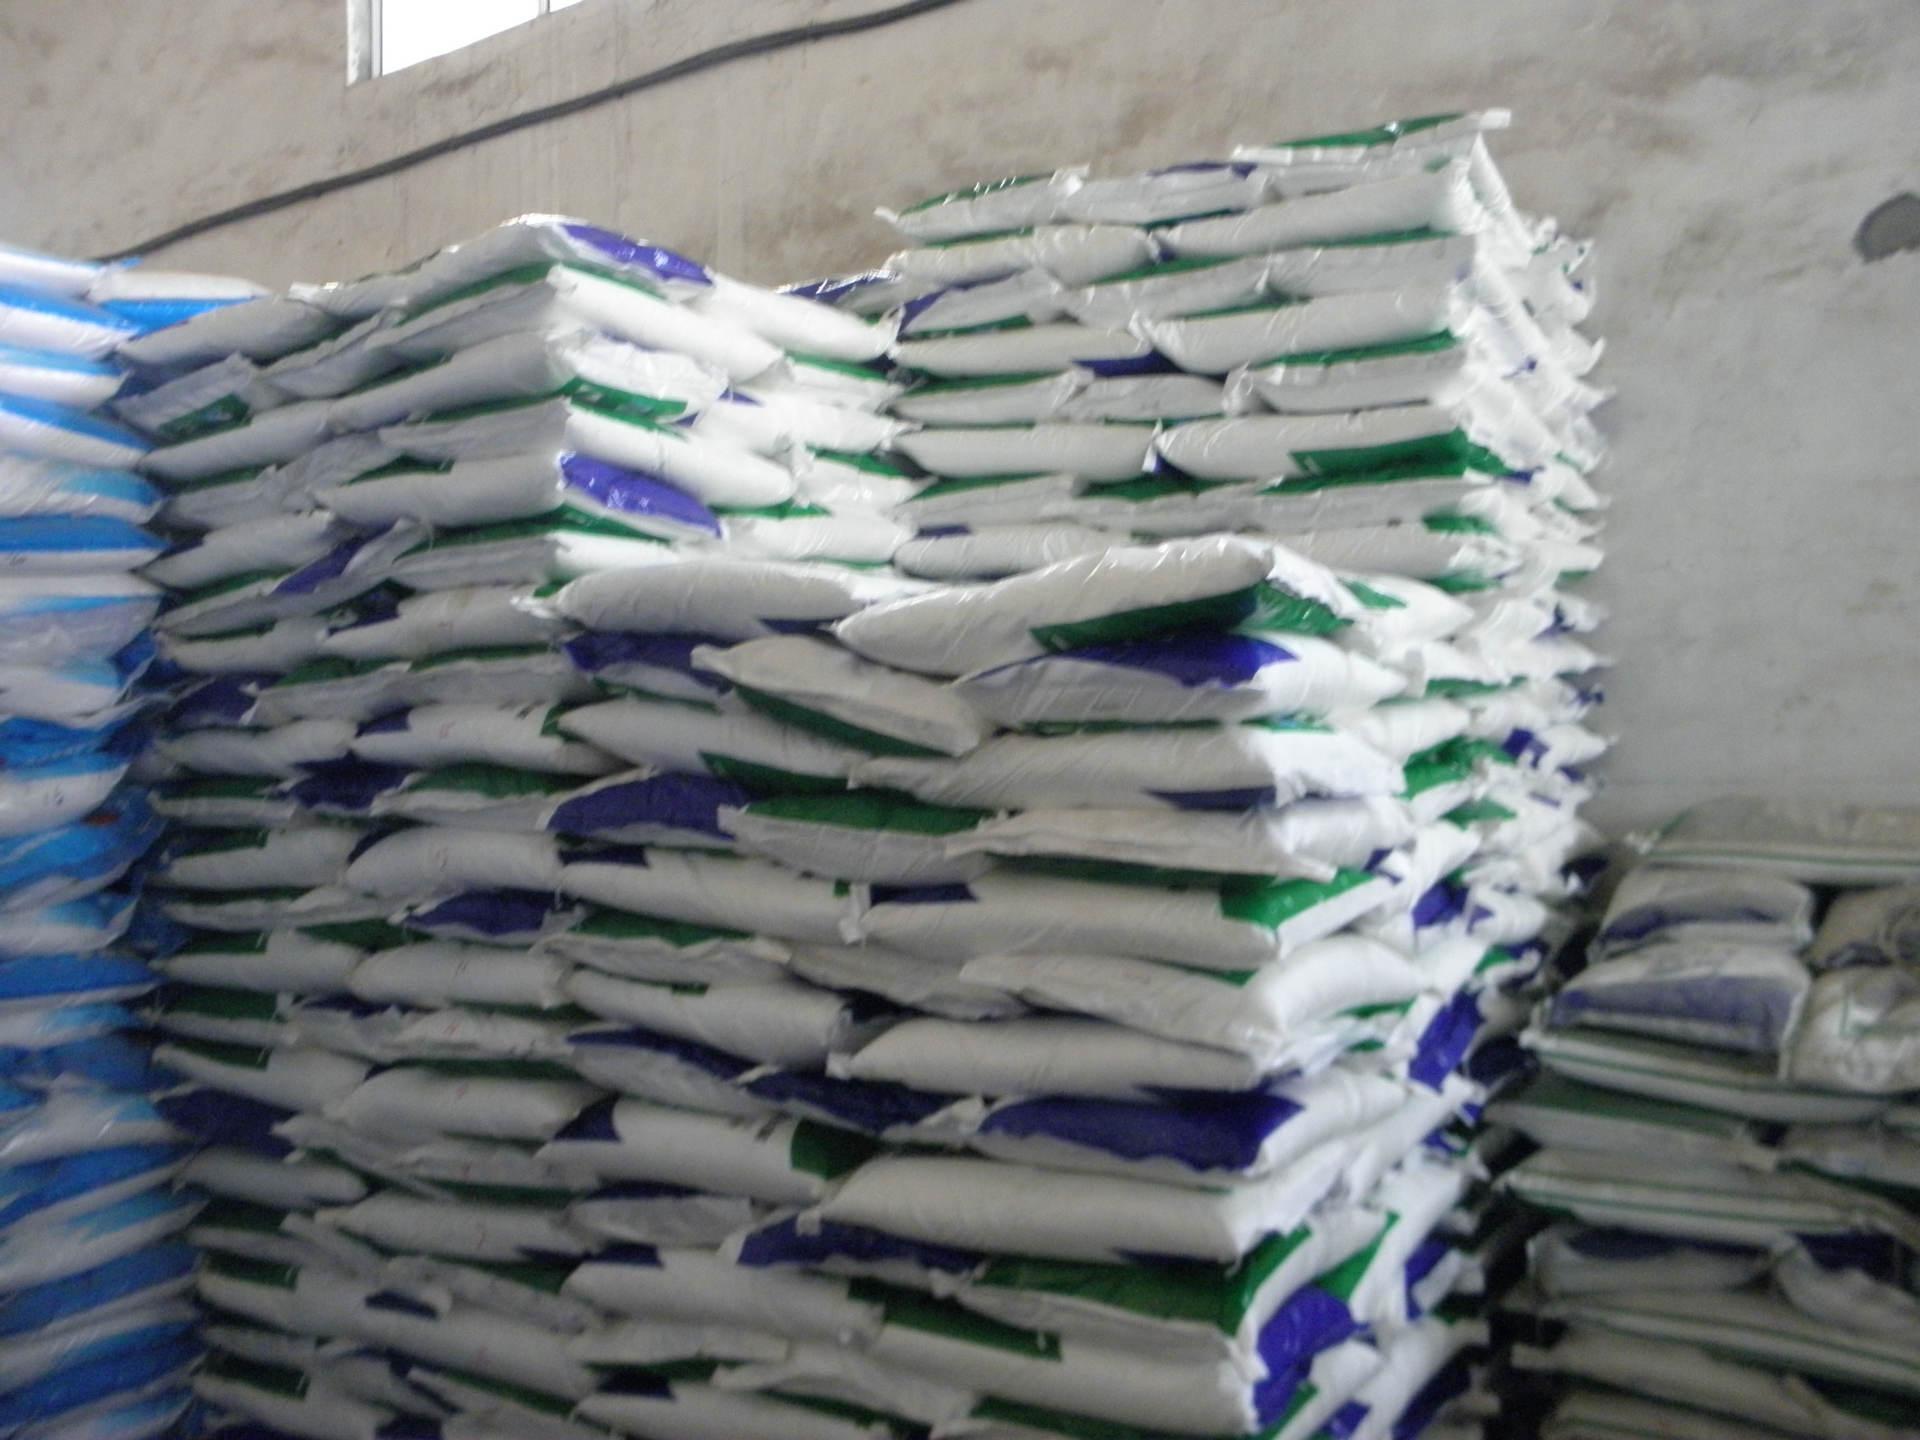 Food grade citric acid, citric acid, citric acid, scale removing, lotus root bleaching equipment, derusting agent, 5 Jin Bao mail